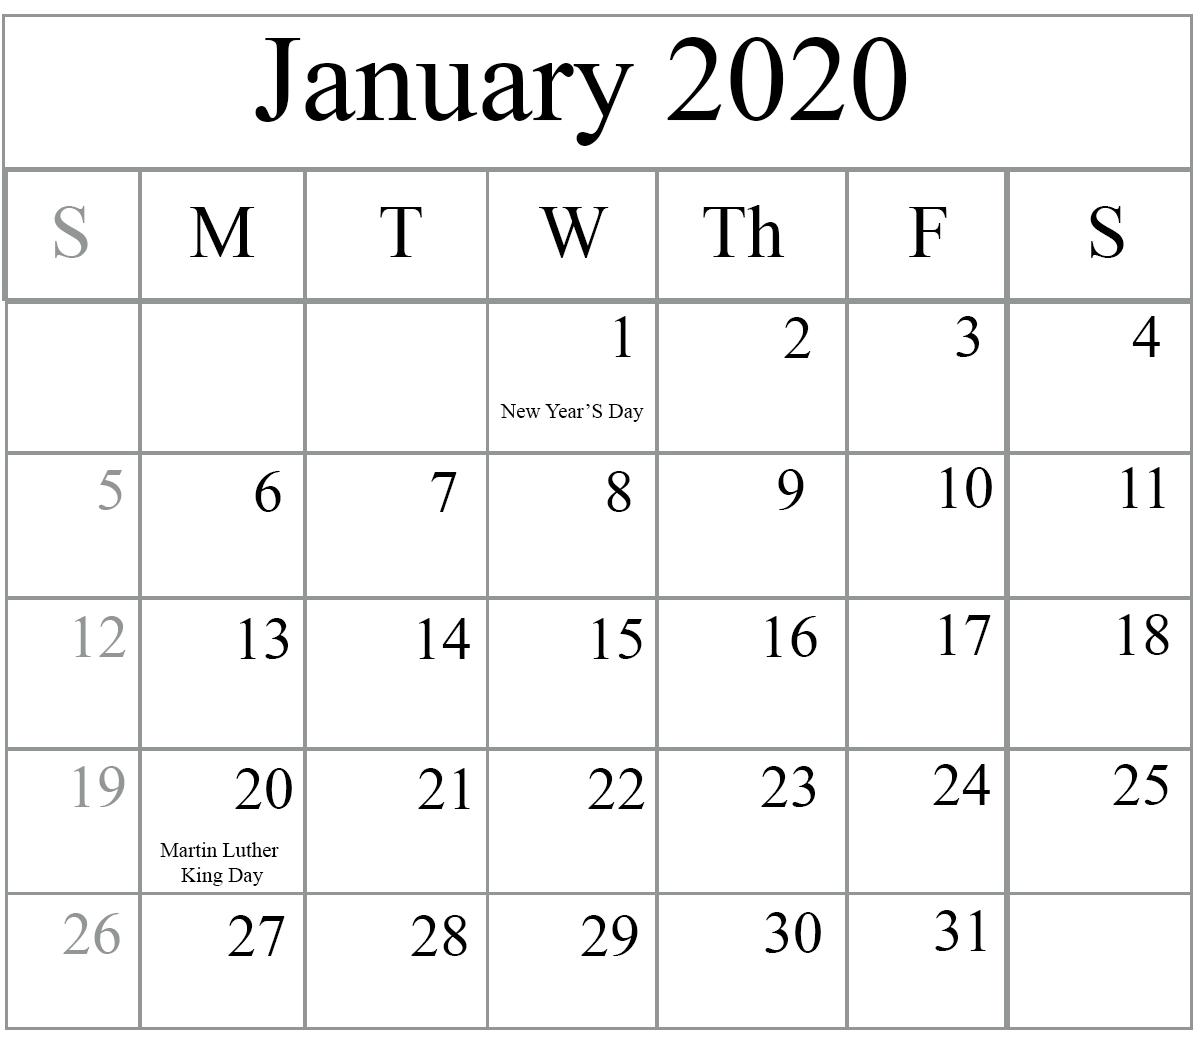 January-2020-Calendar-1 | How To Wiki-Wiki Calendar January 2020